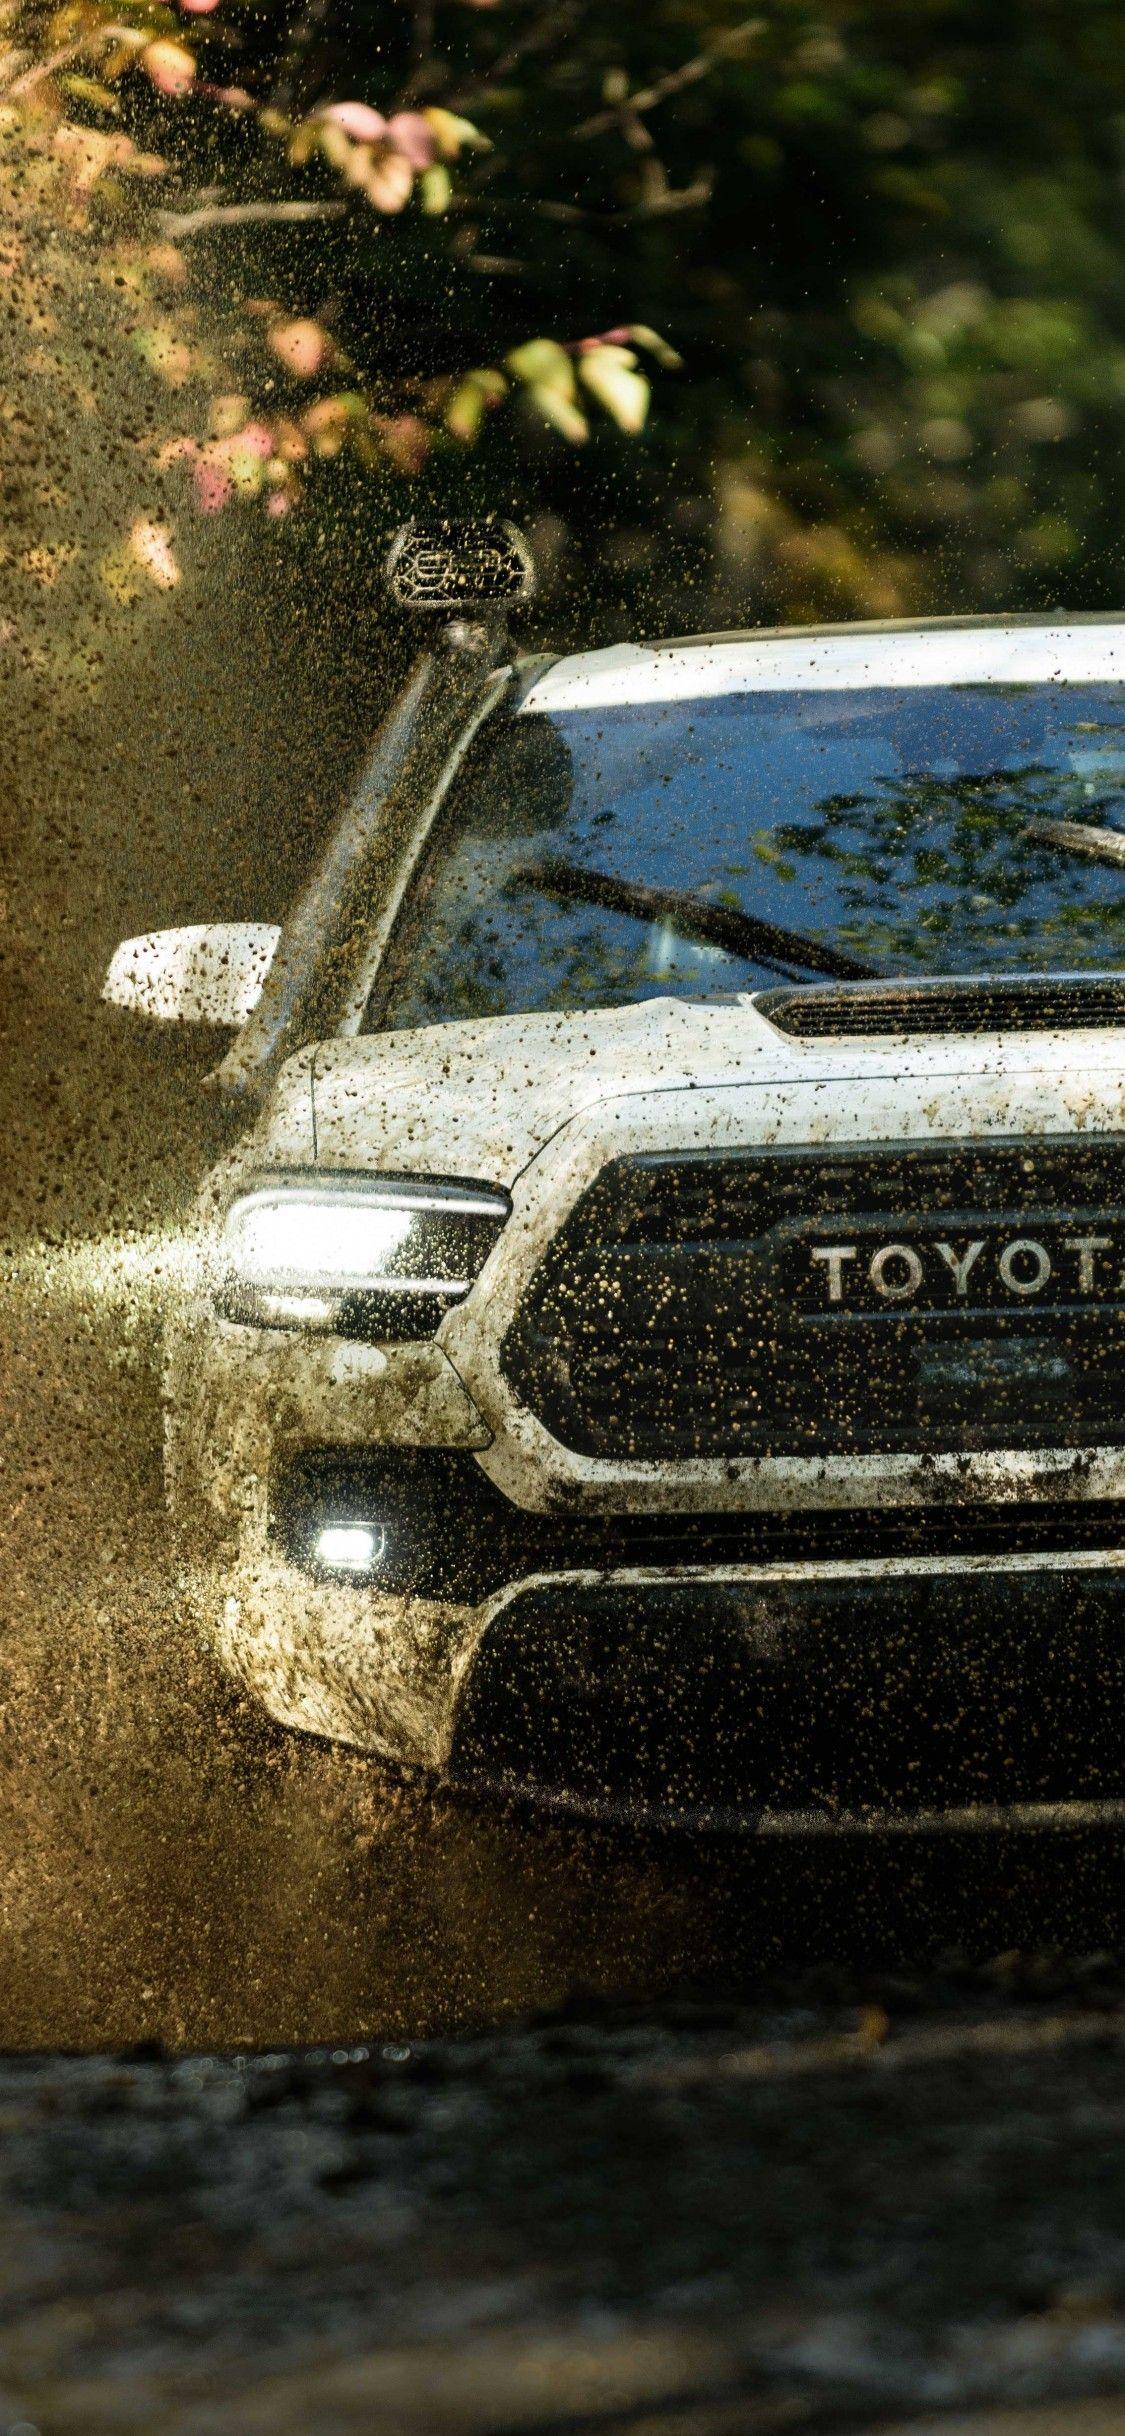 jv-ambrosia: Toyota Logo Wallpaper Iphone